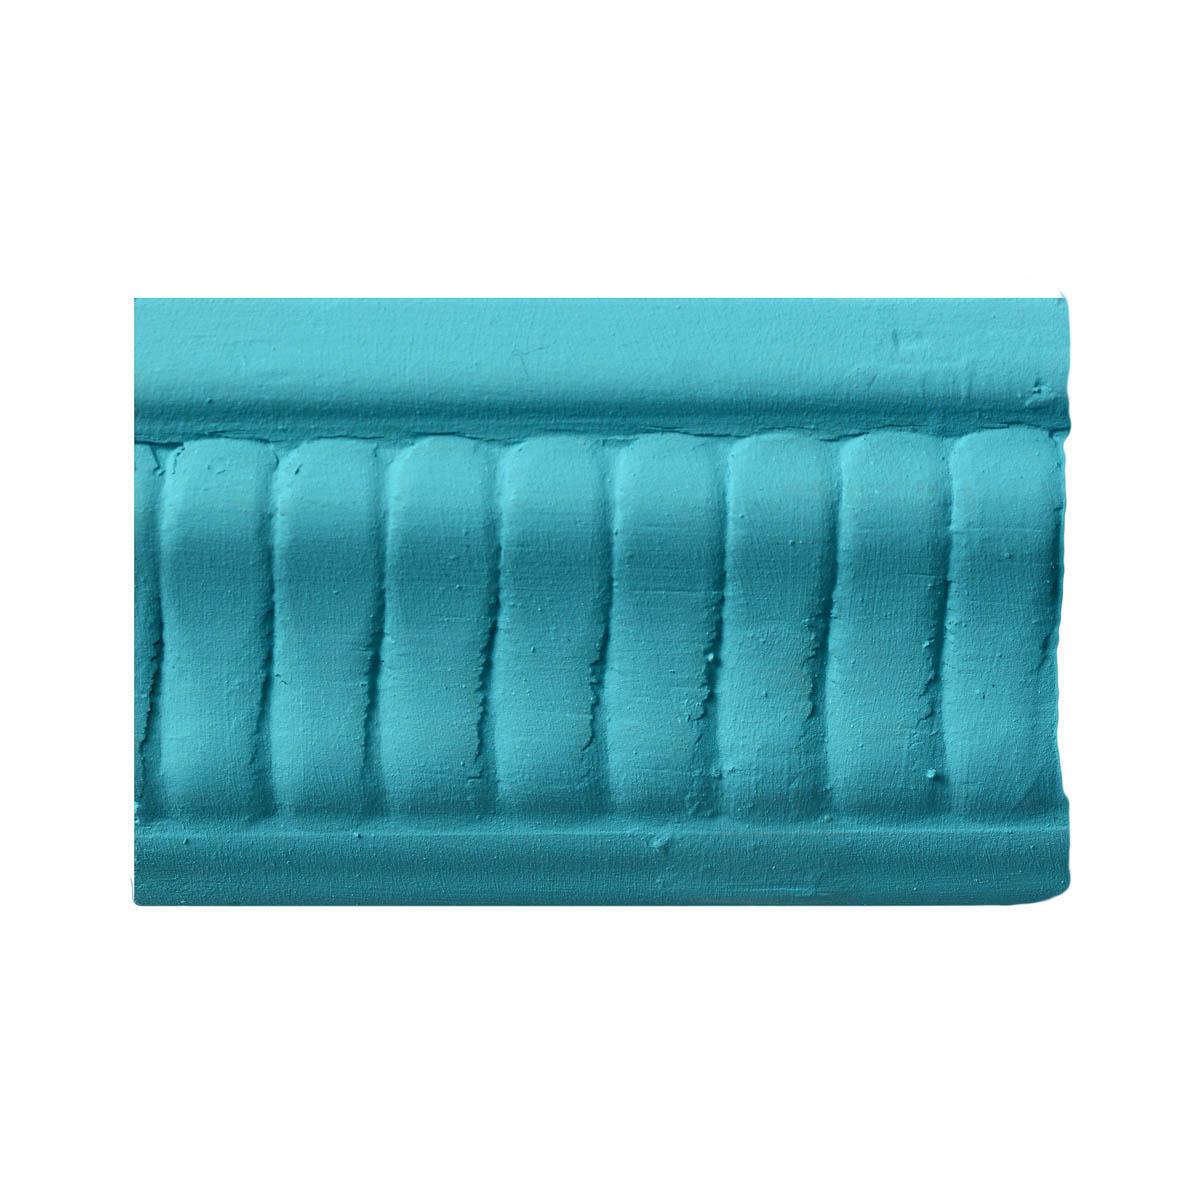 Waverly ® Inspirations Chalk Finish Acrylic Paint - Lagoon, 2 oz. - 60889E